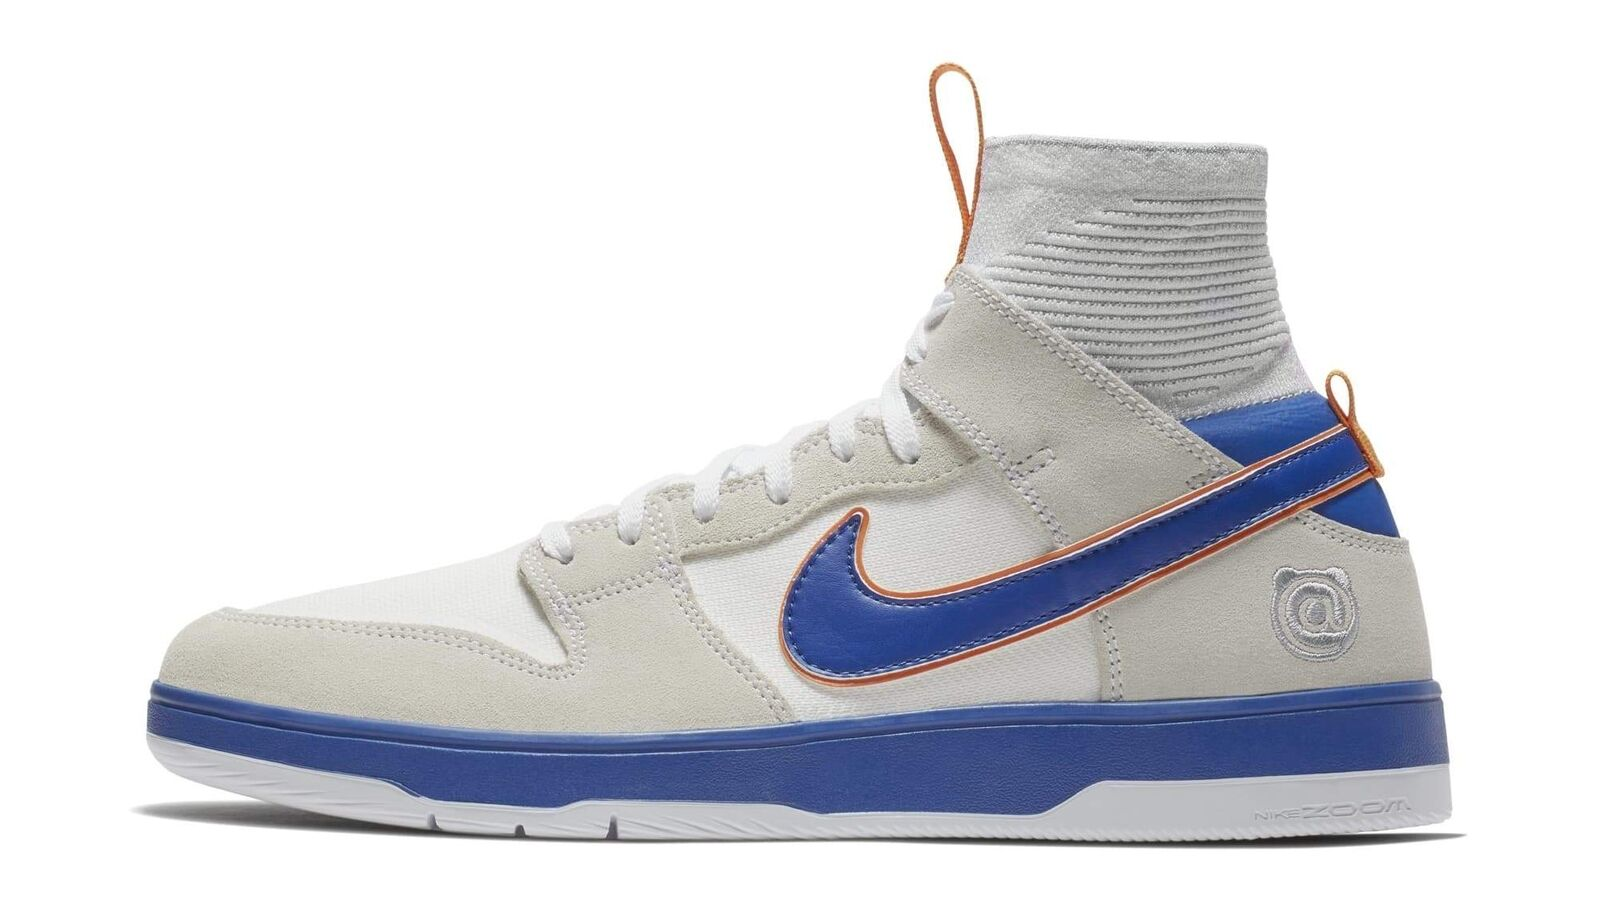 Nike x Medicom SB Zoom Dunk Elite High Bearbrick White College Blue 918287-147 Casual wild